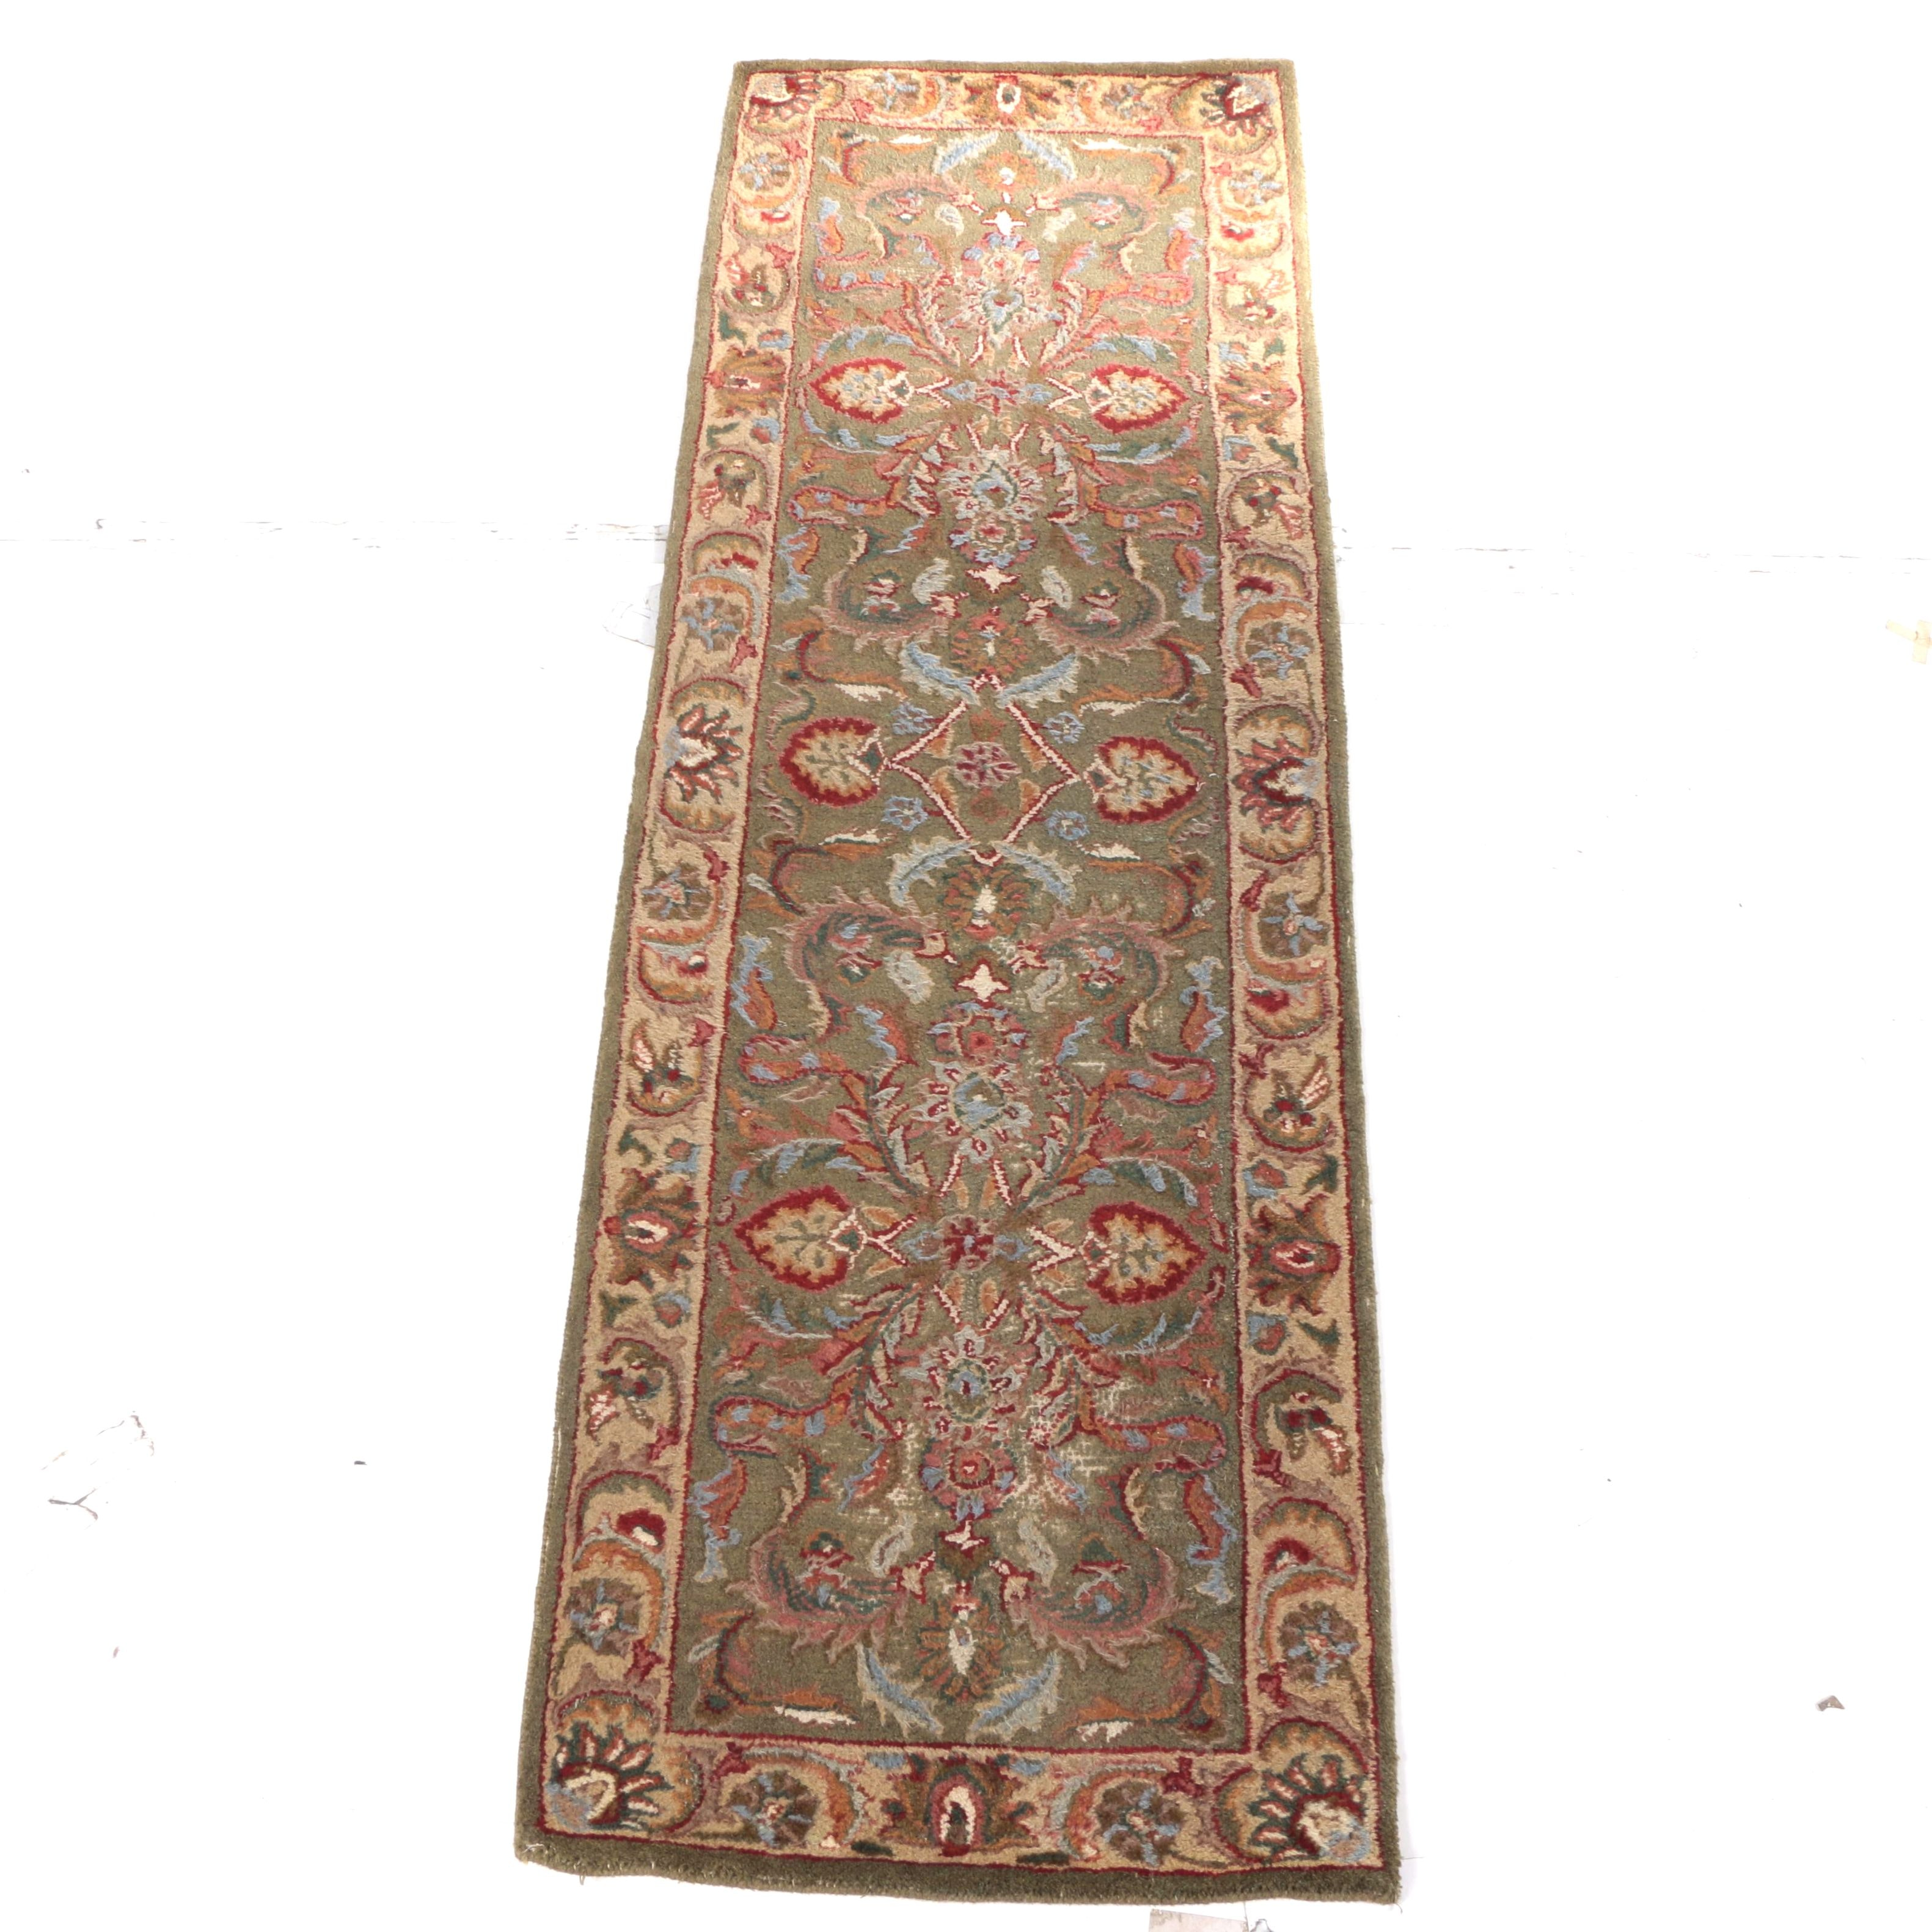 Hand-Tufted Floral Carpet Runner by Bon Motif